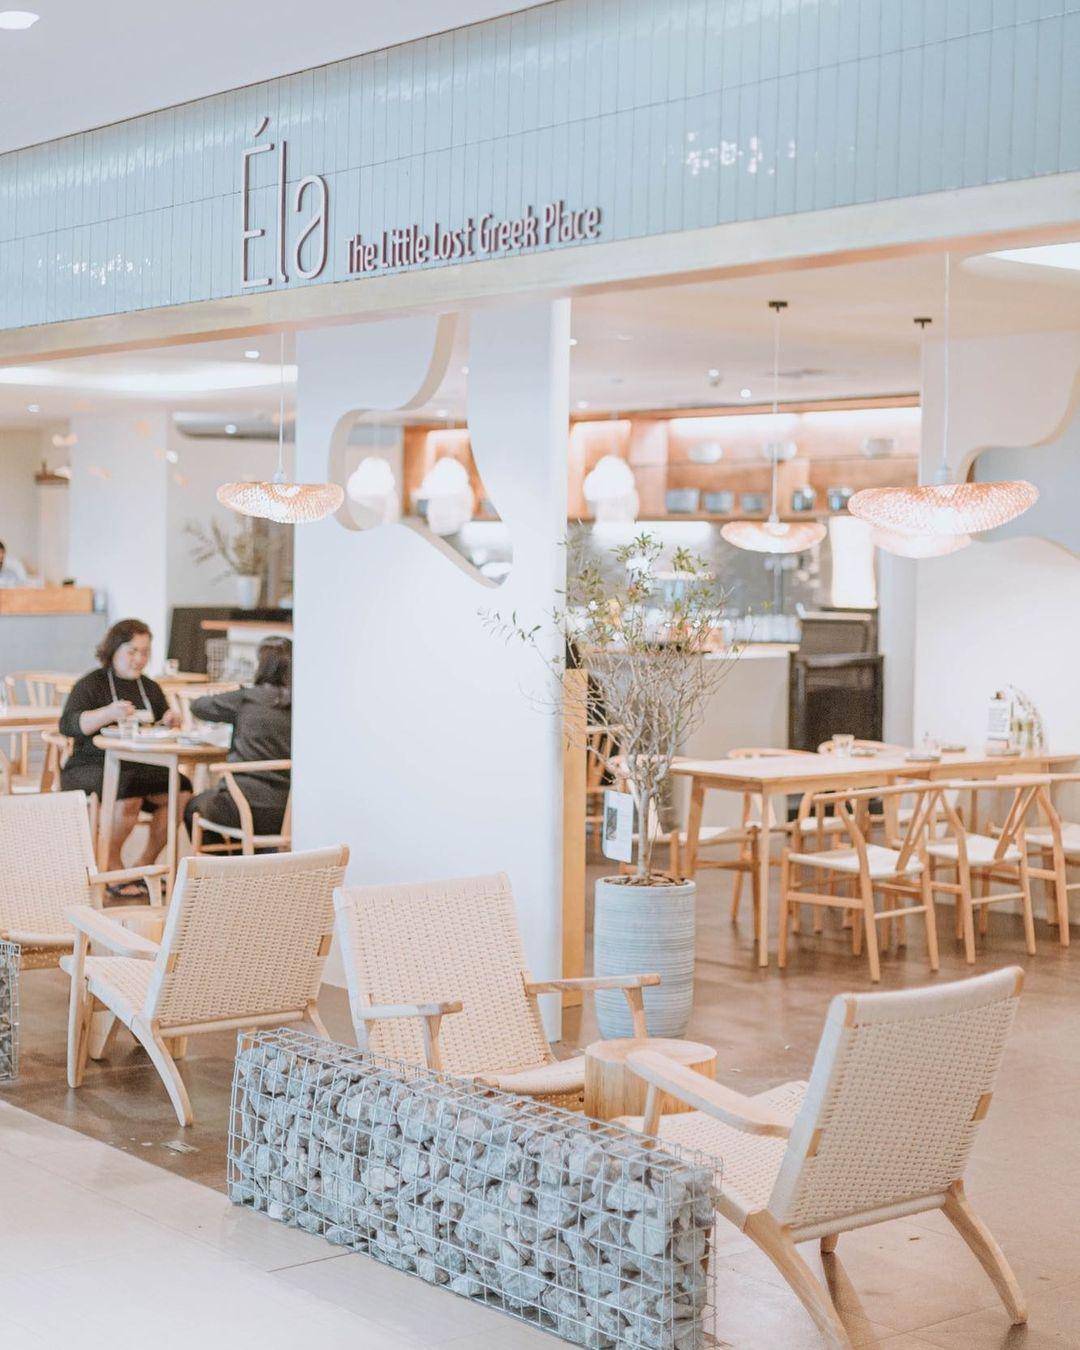 New Cafes And Restaurants June 2021 - Ela